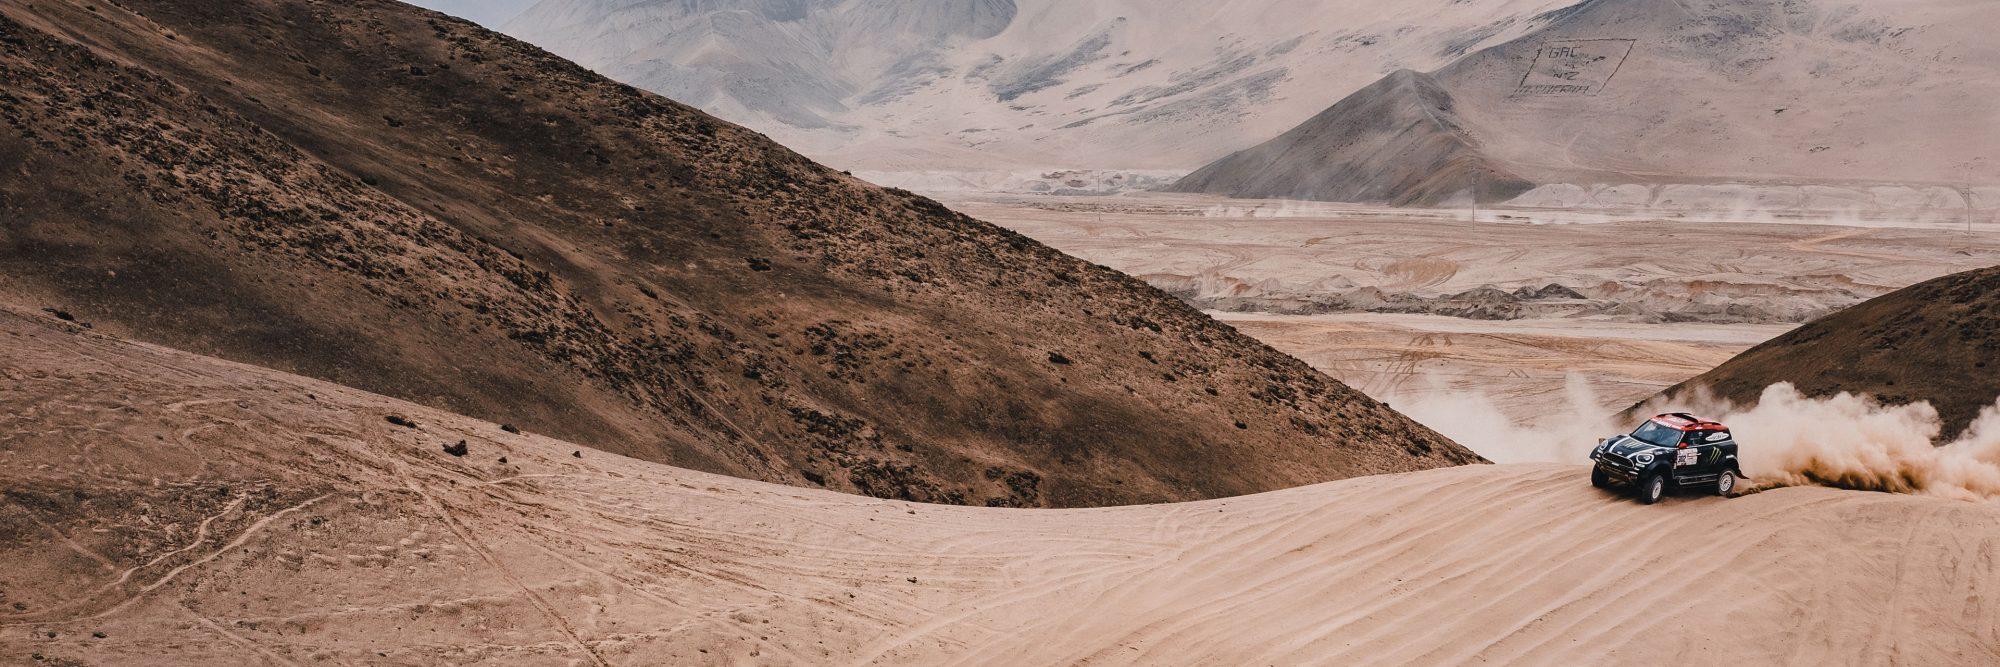 Dakar Rally 2018 — Peru with MINI X-Raid